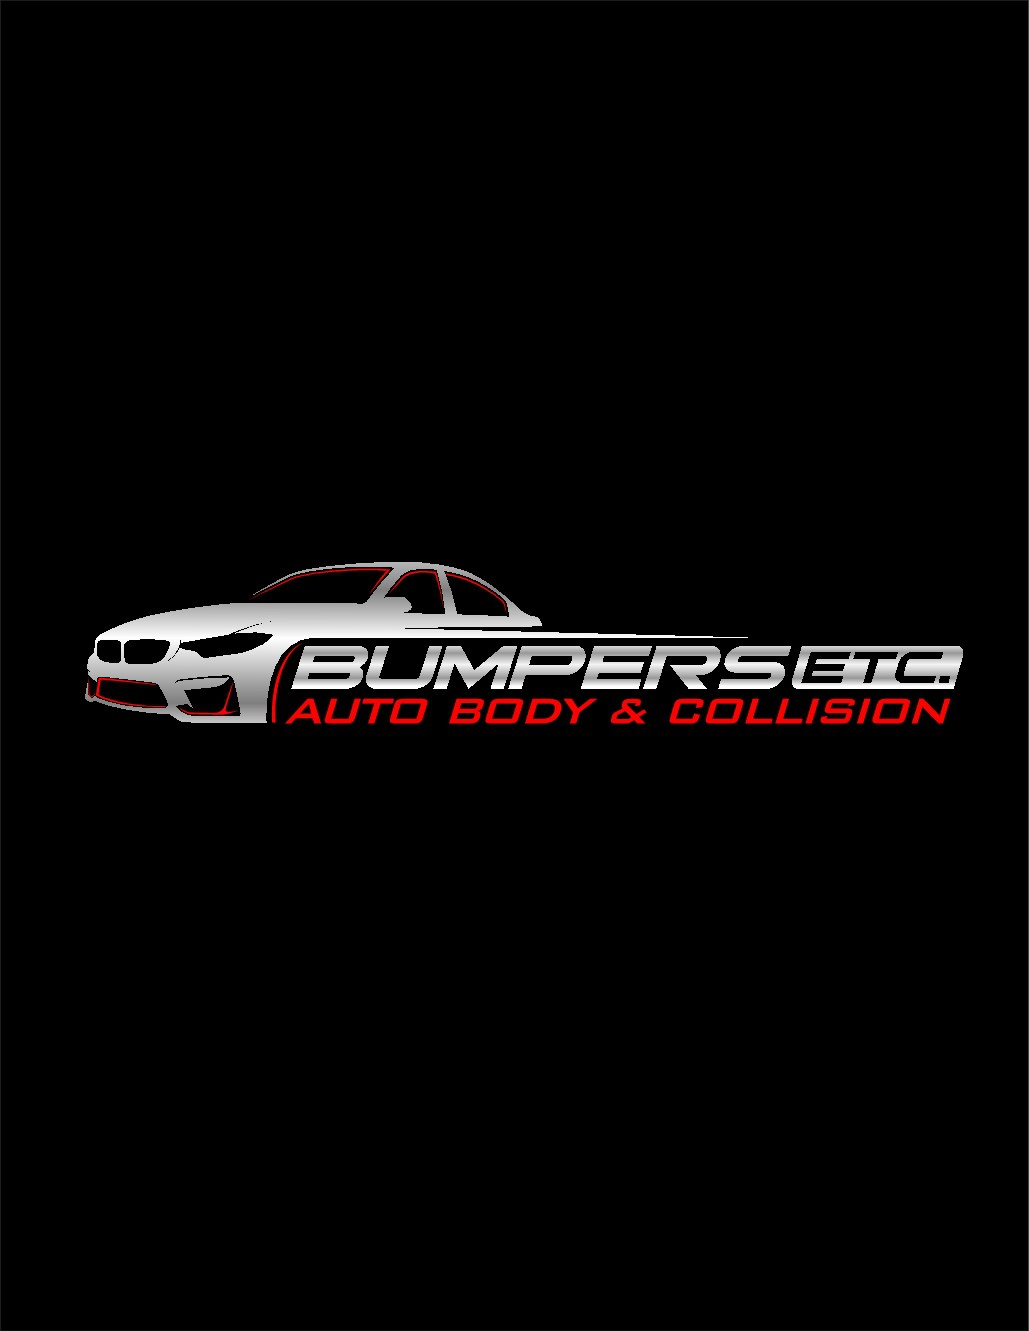 BumpersEtc.com Needs A Fresh Look/Logo